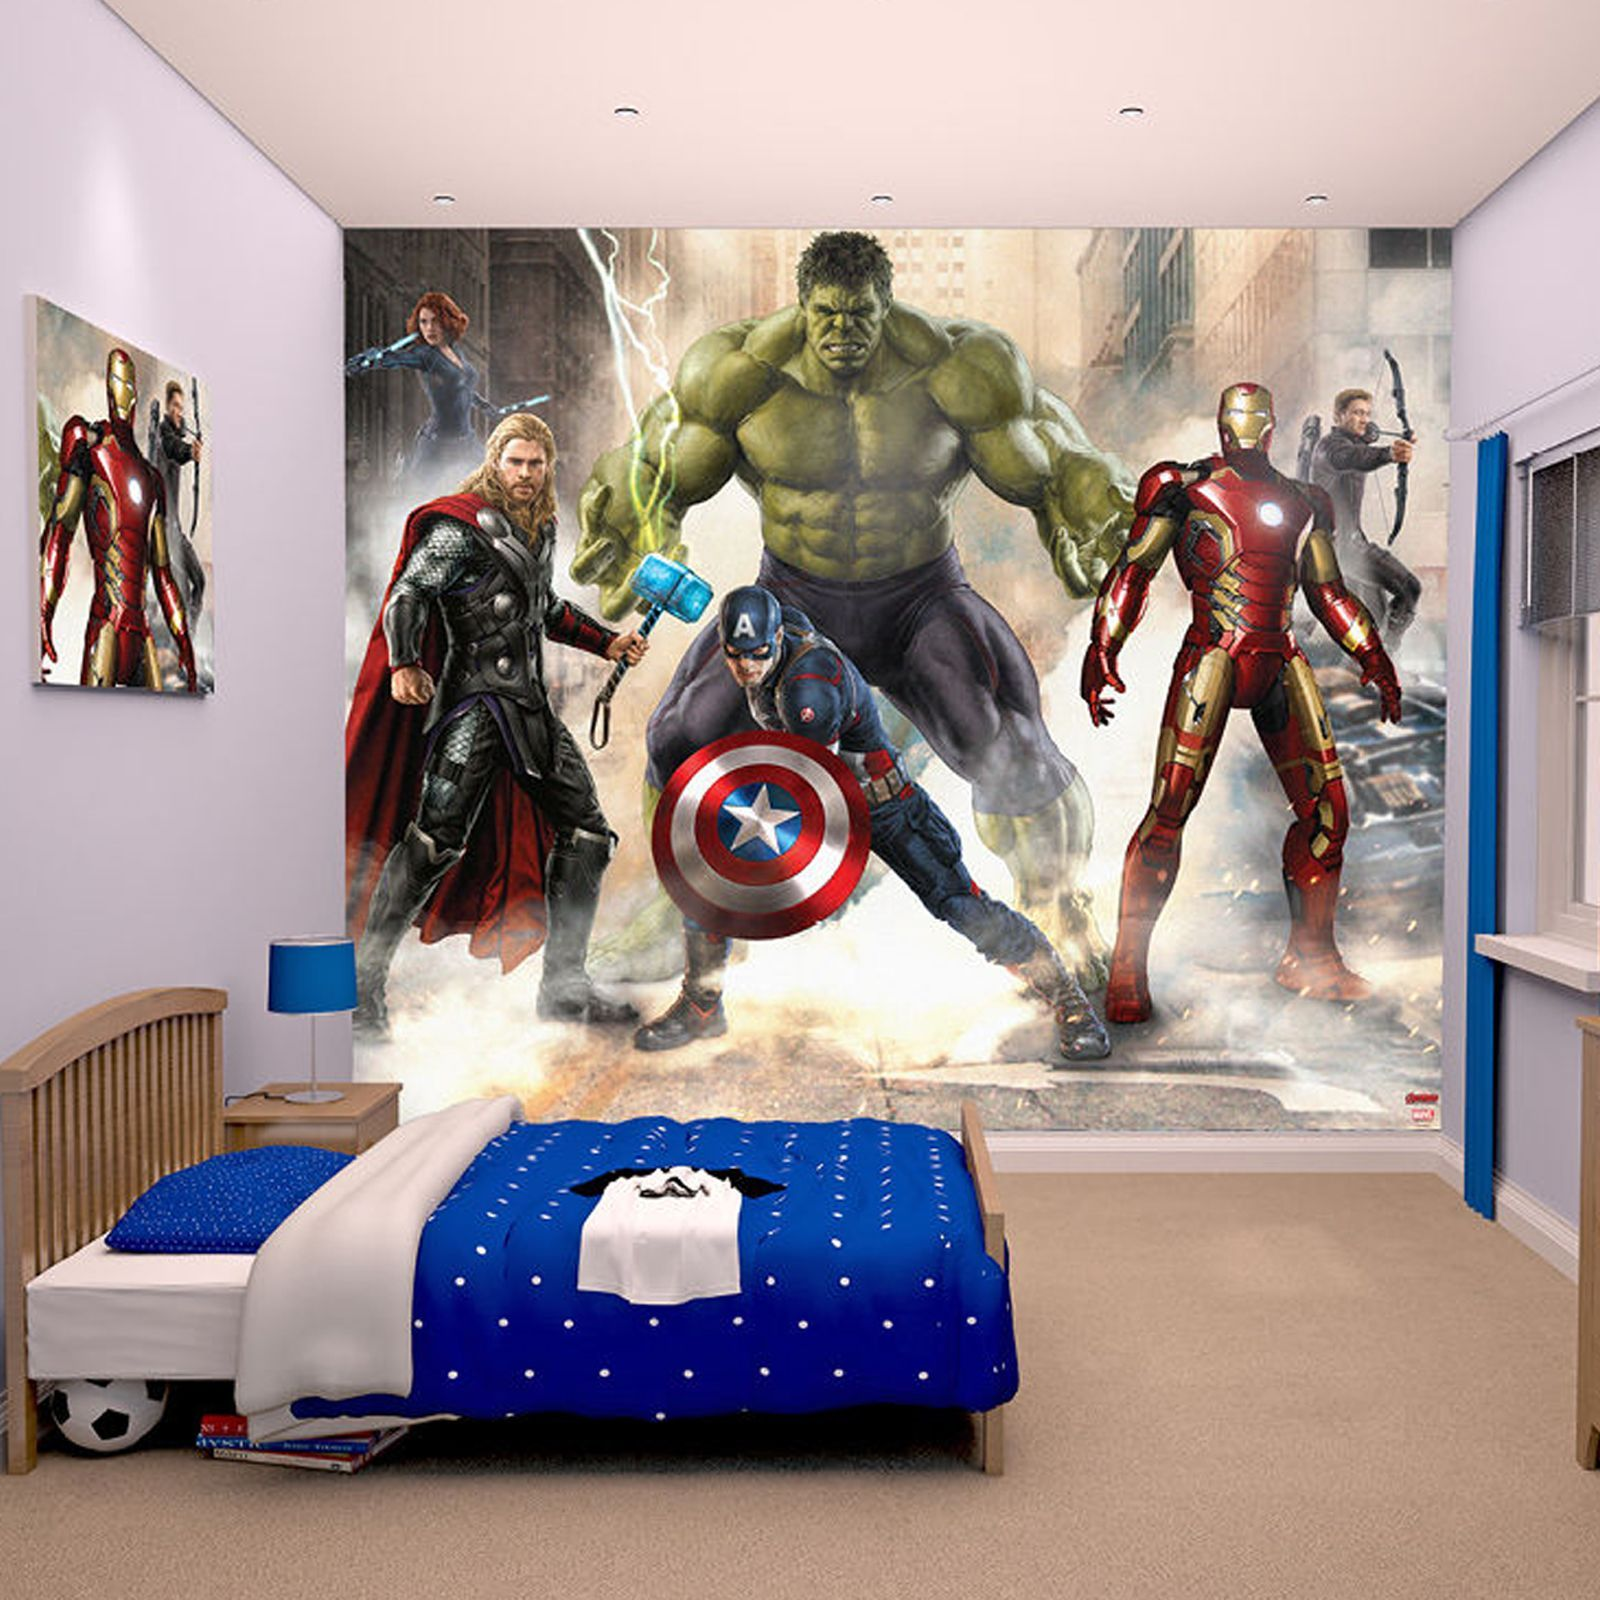 Best Wallpaper Marvel Wall - af9240417f7e74ff8c1ae54030a64b0e  Pic_31770.jpg